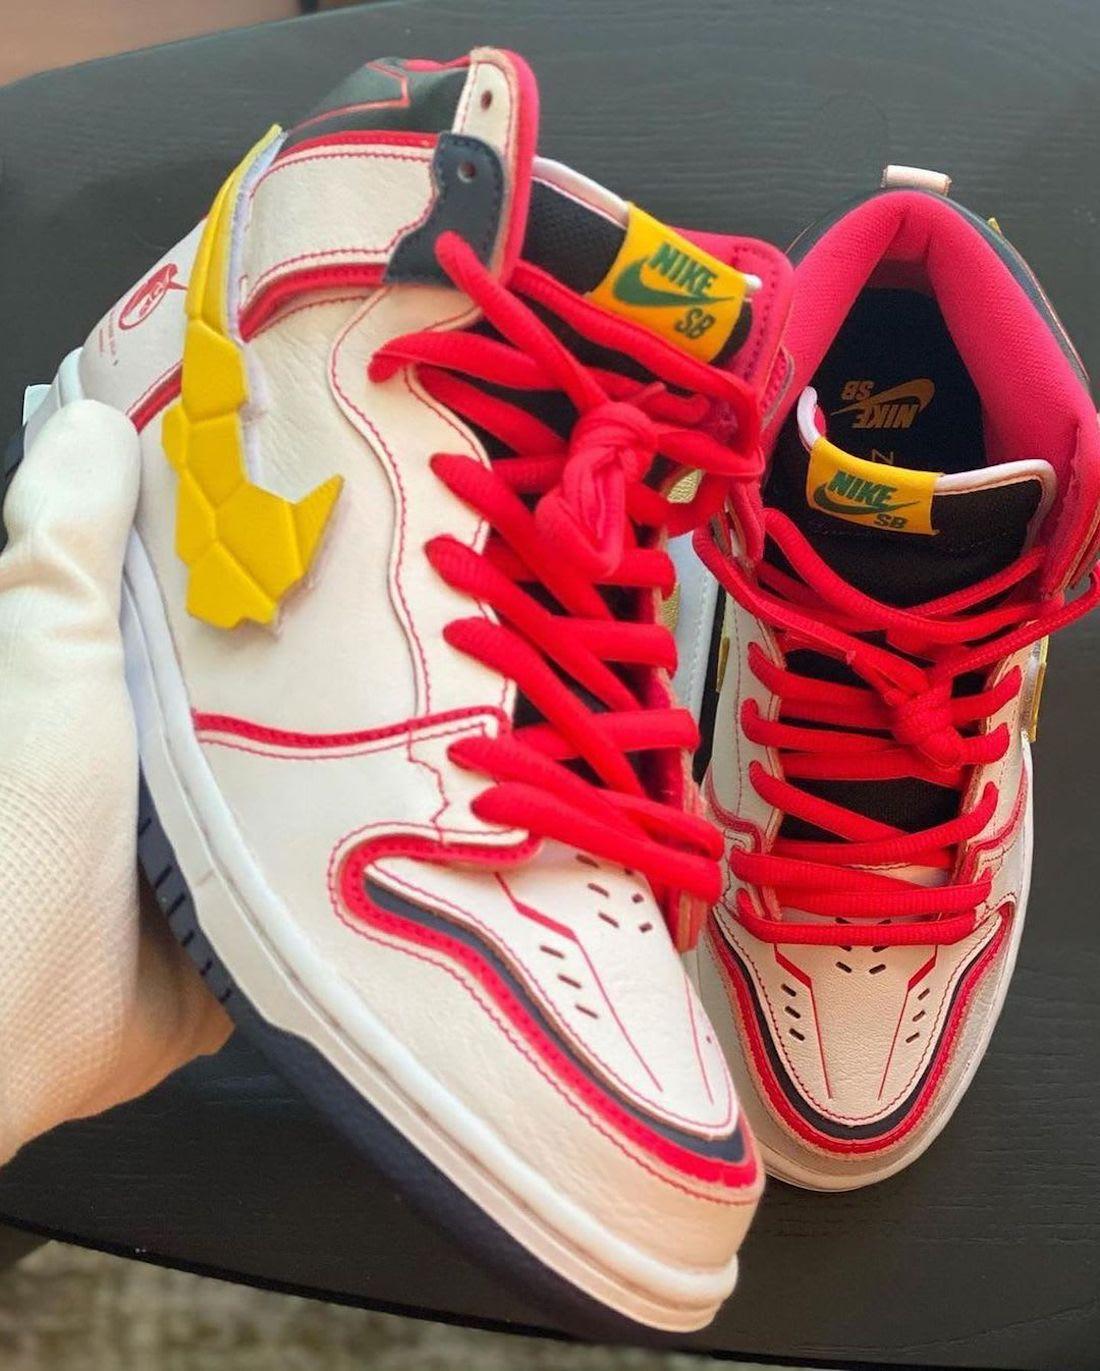 Nike,Dunk SB Hi,高达,曝光  满满的童年回忆!高达联名 Dunk SB 预计今夏发售!